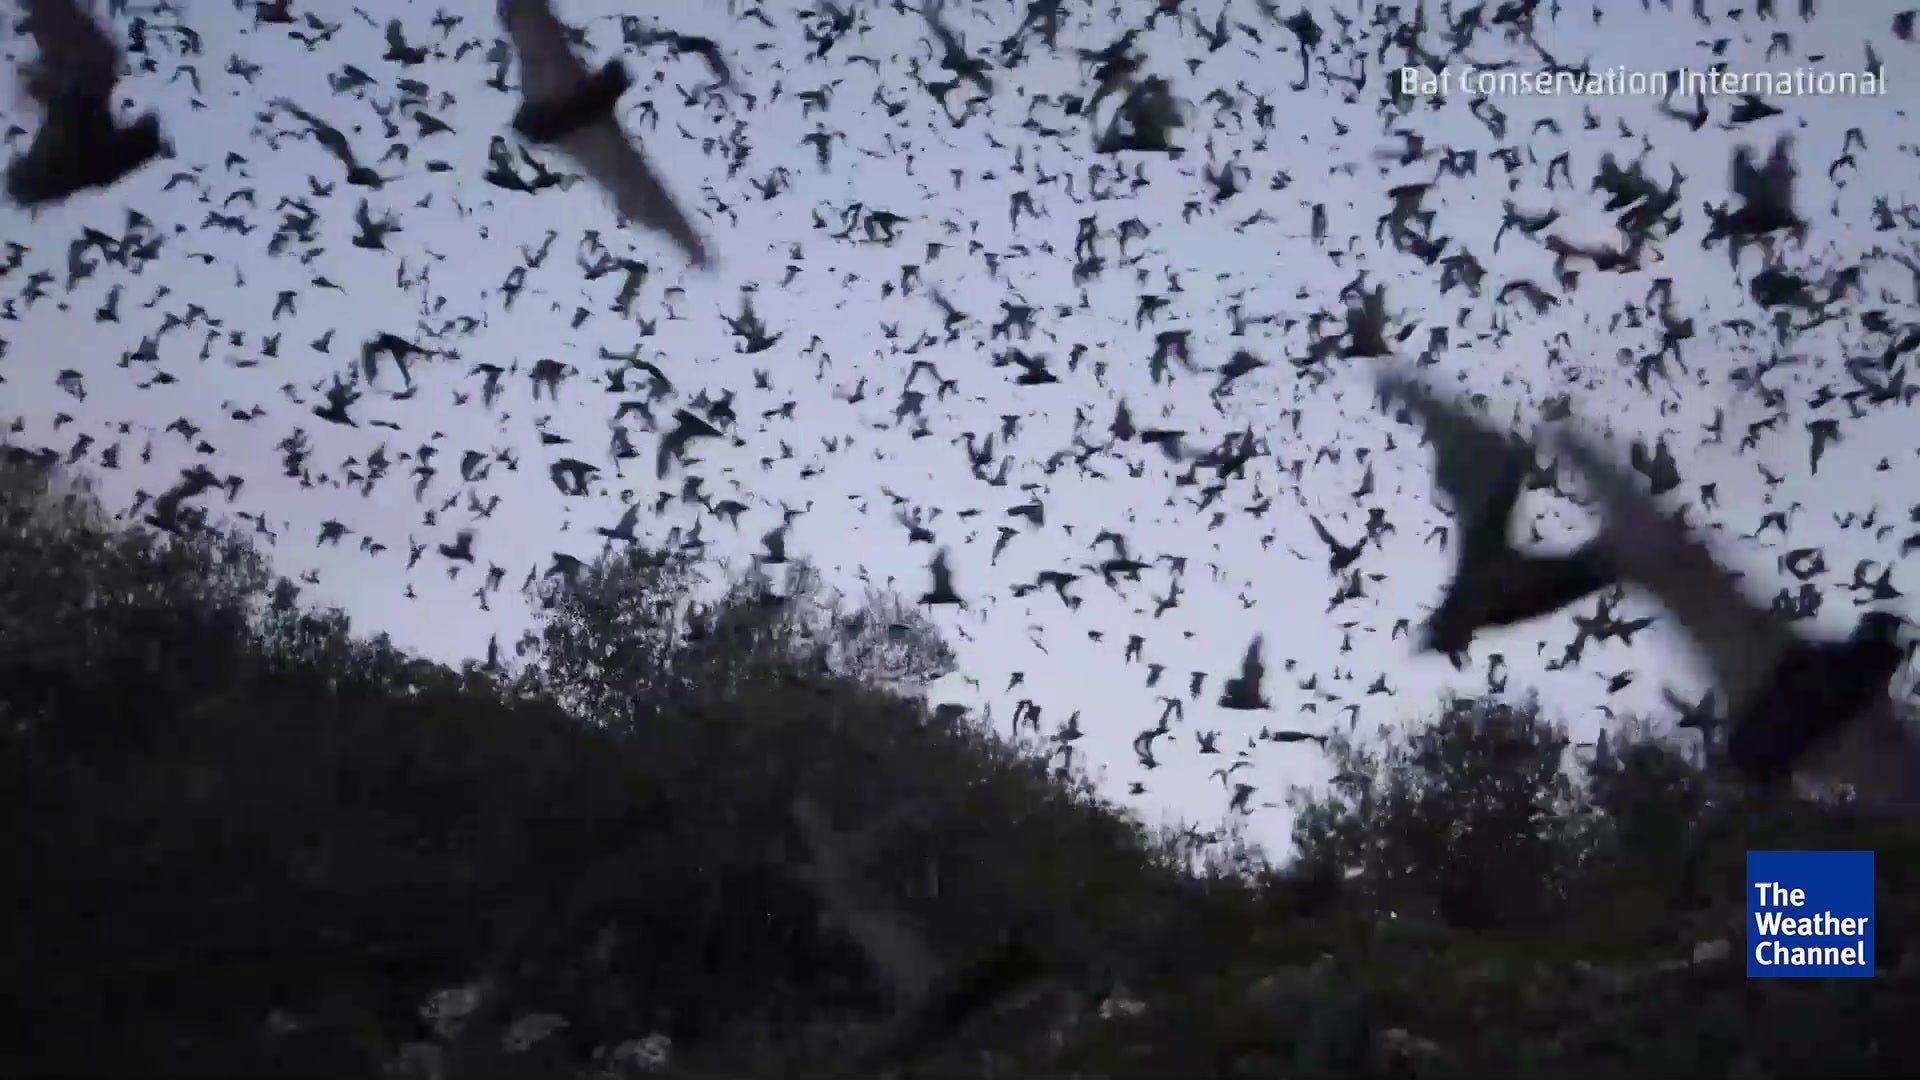 Millions of Bats Take Flight in Texas, Watch LIVE Tonight